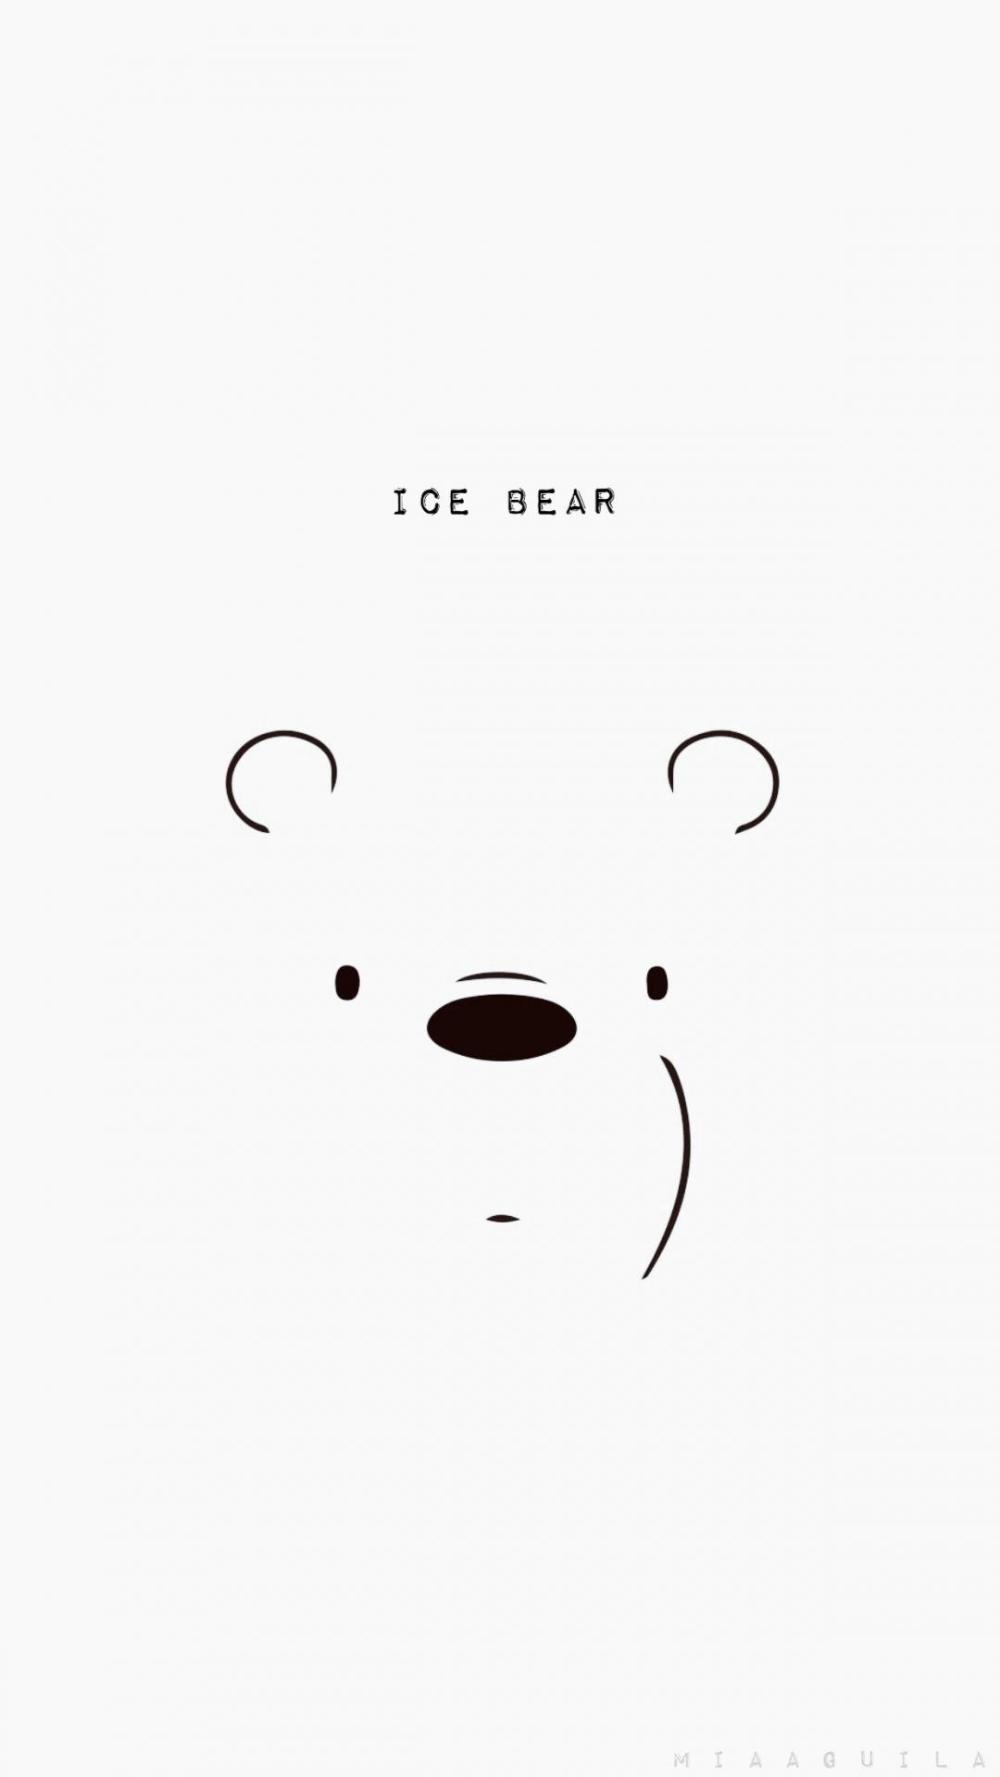 Baby Ice Bear We Bare Bears Wallpaper Hd Allwallpaper Ice Bear We Bare Bears Bear Wallpaper We Bare Bears Wallpapers